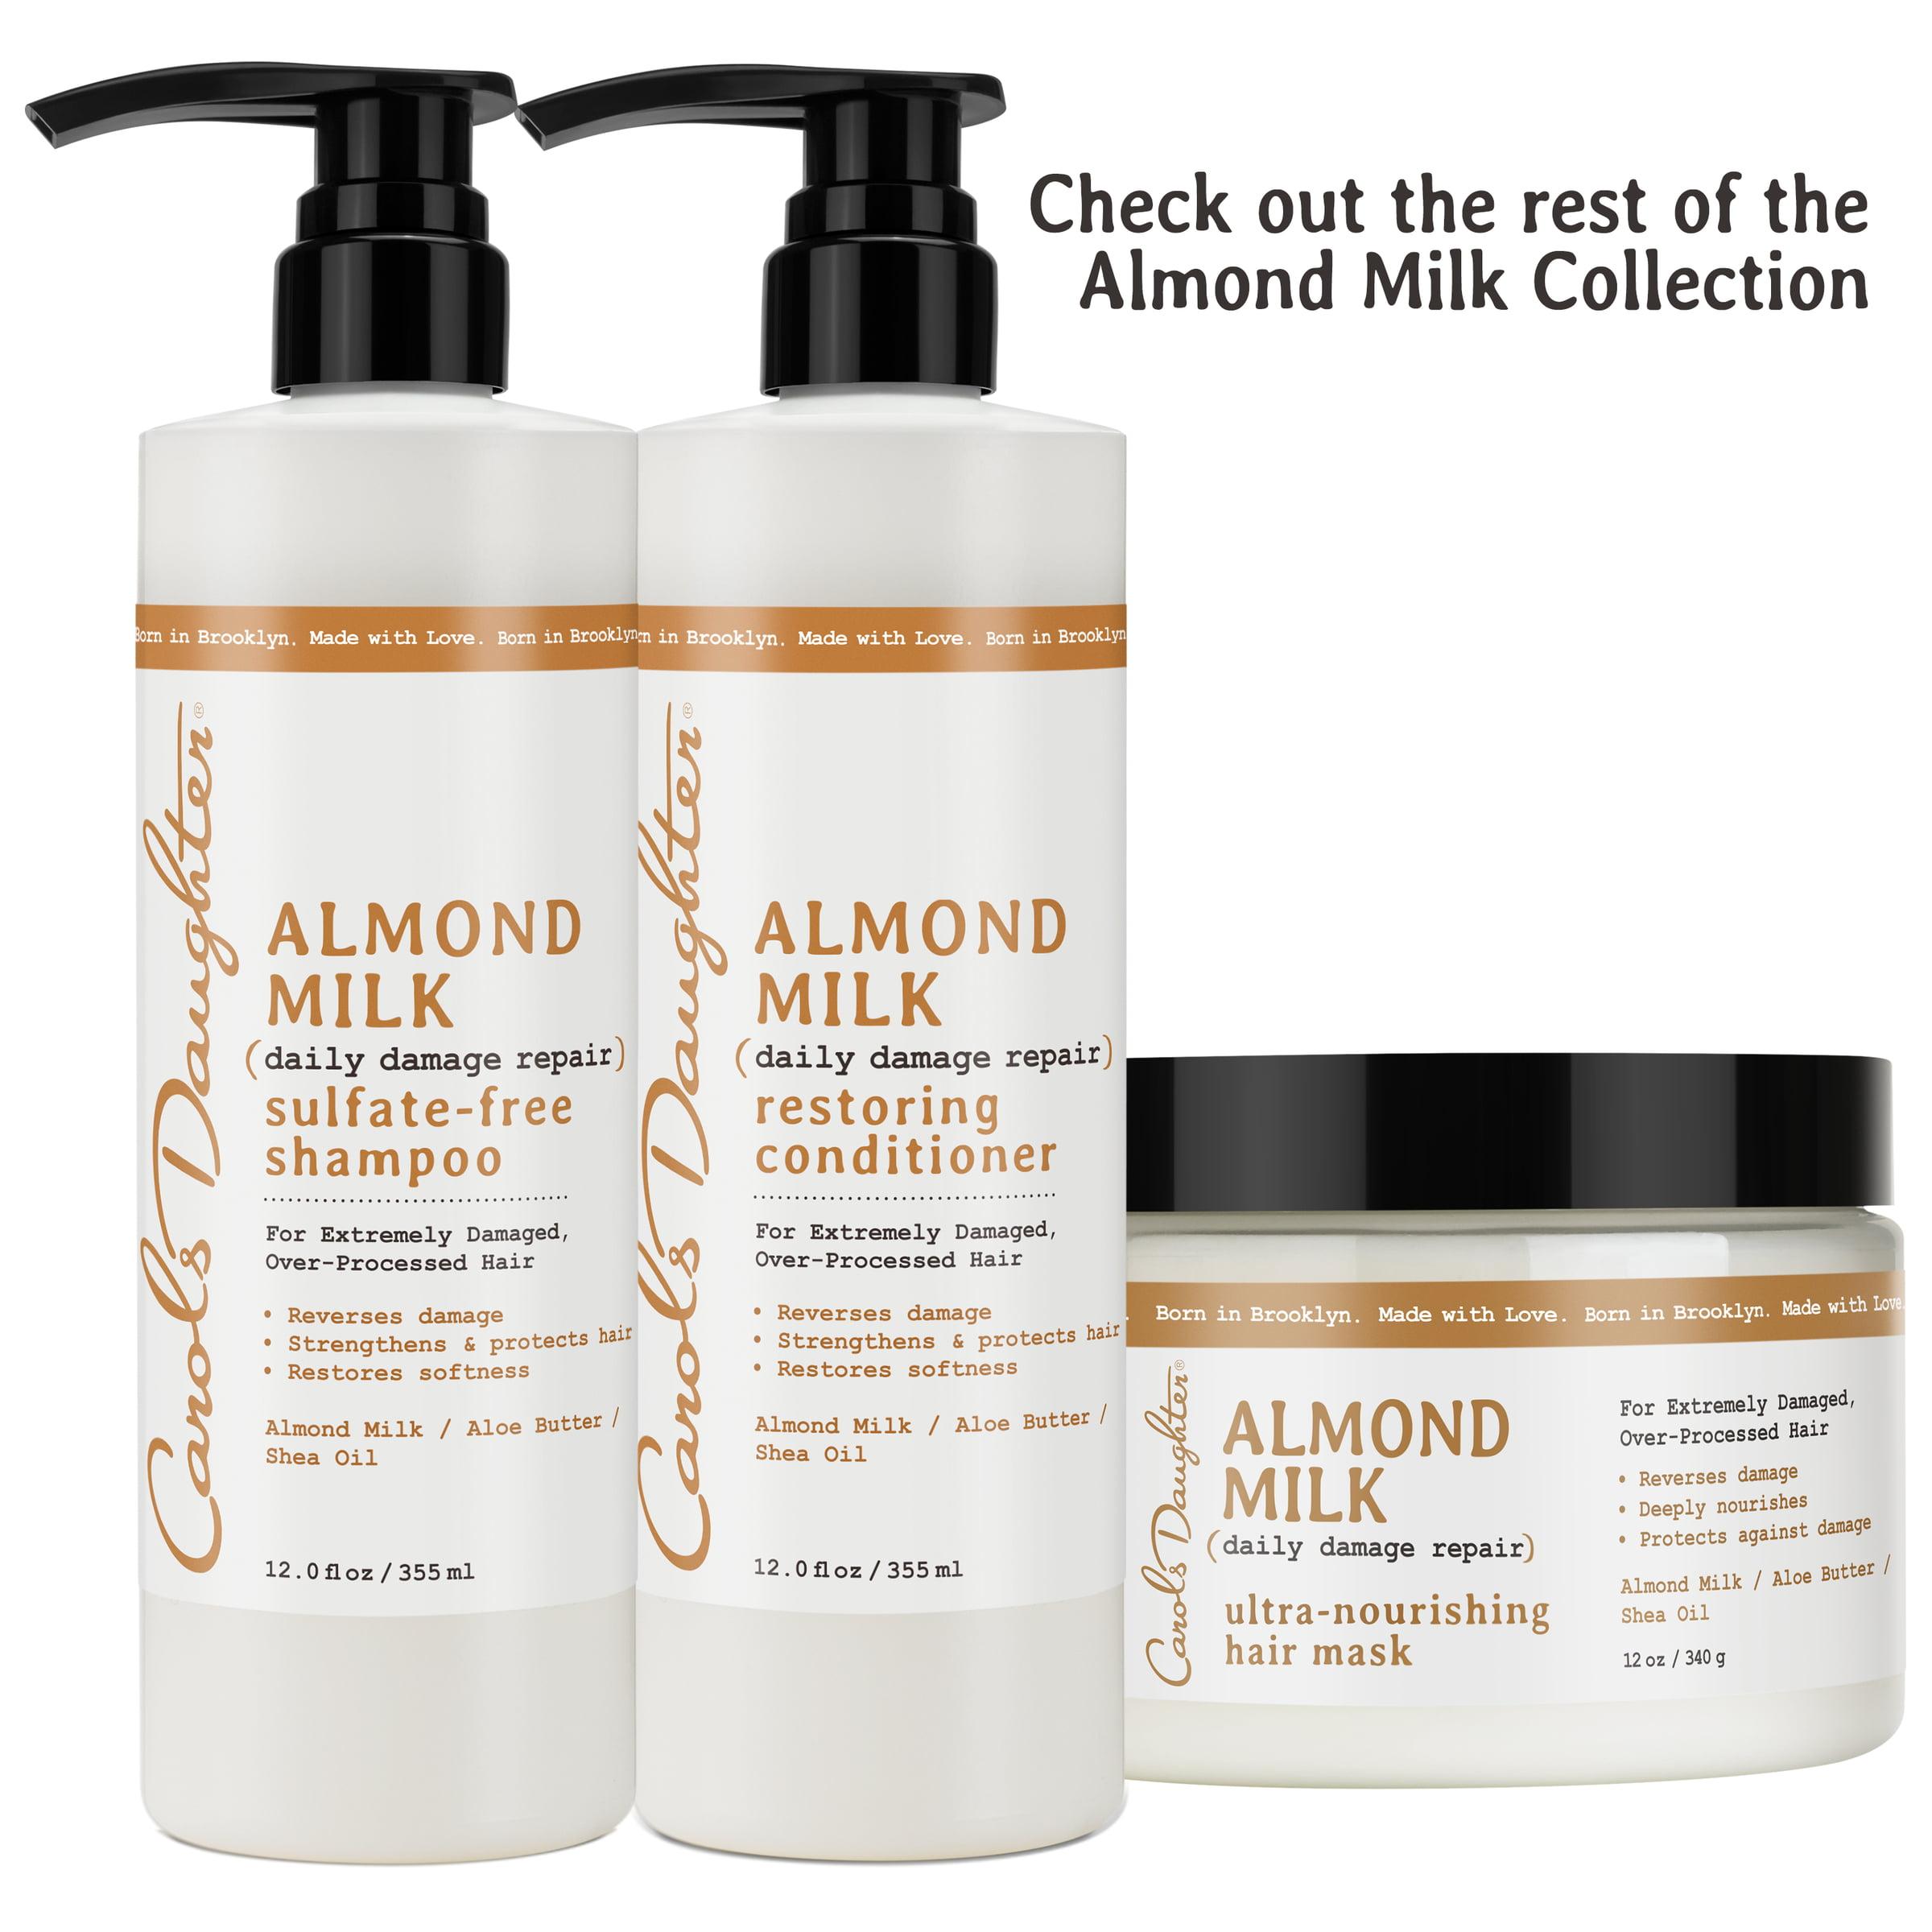 2fc66fdb1b Carol s Daughter Almond Milk Ultra-Nourishing Hair Mask 12 OZ - Walmart.com